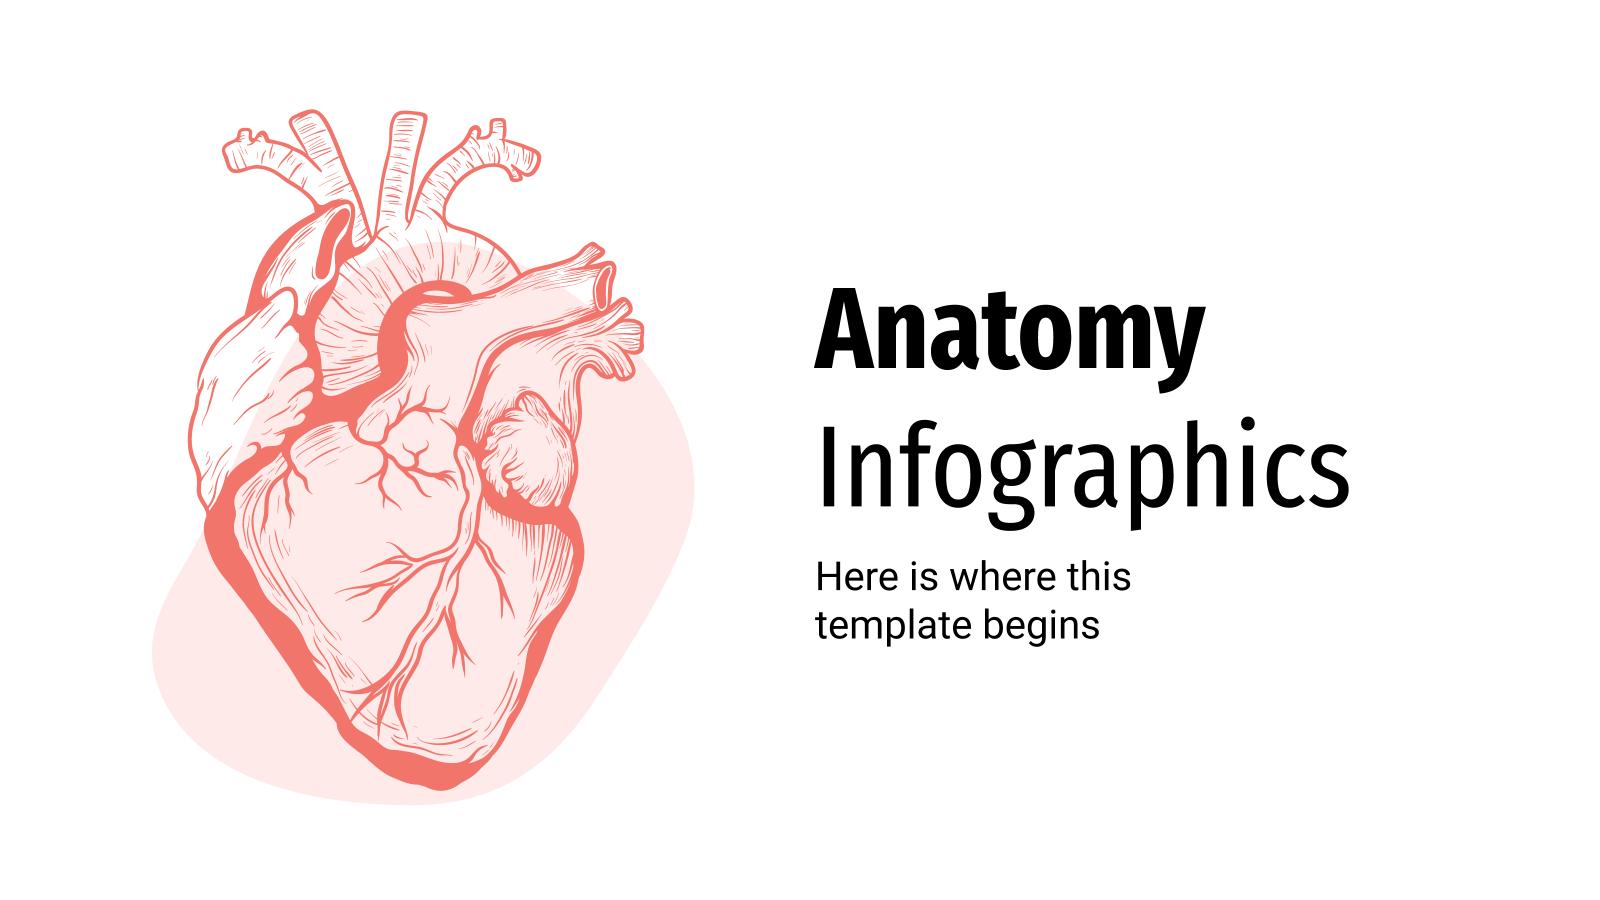 Anatomy Infographics presentation template